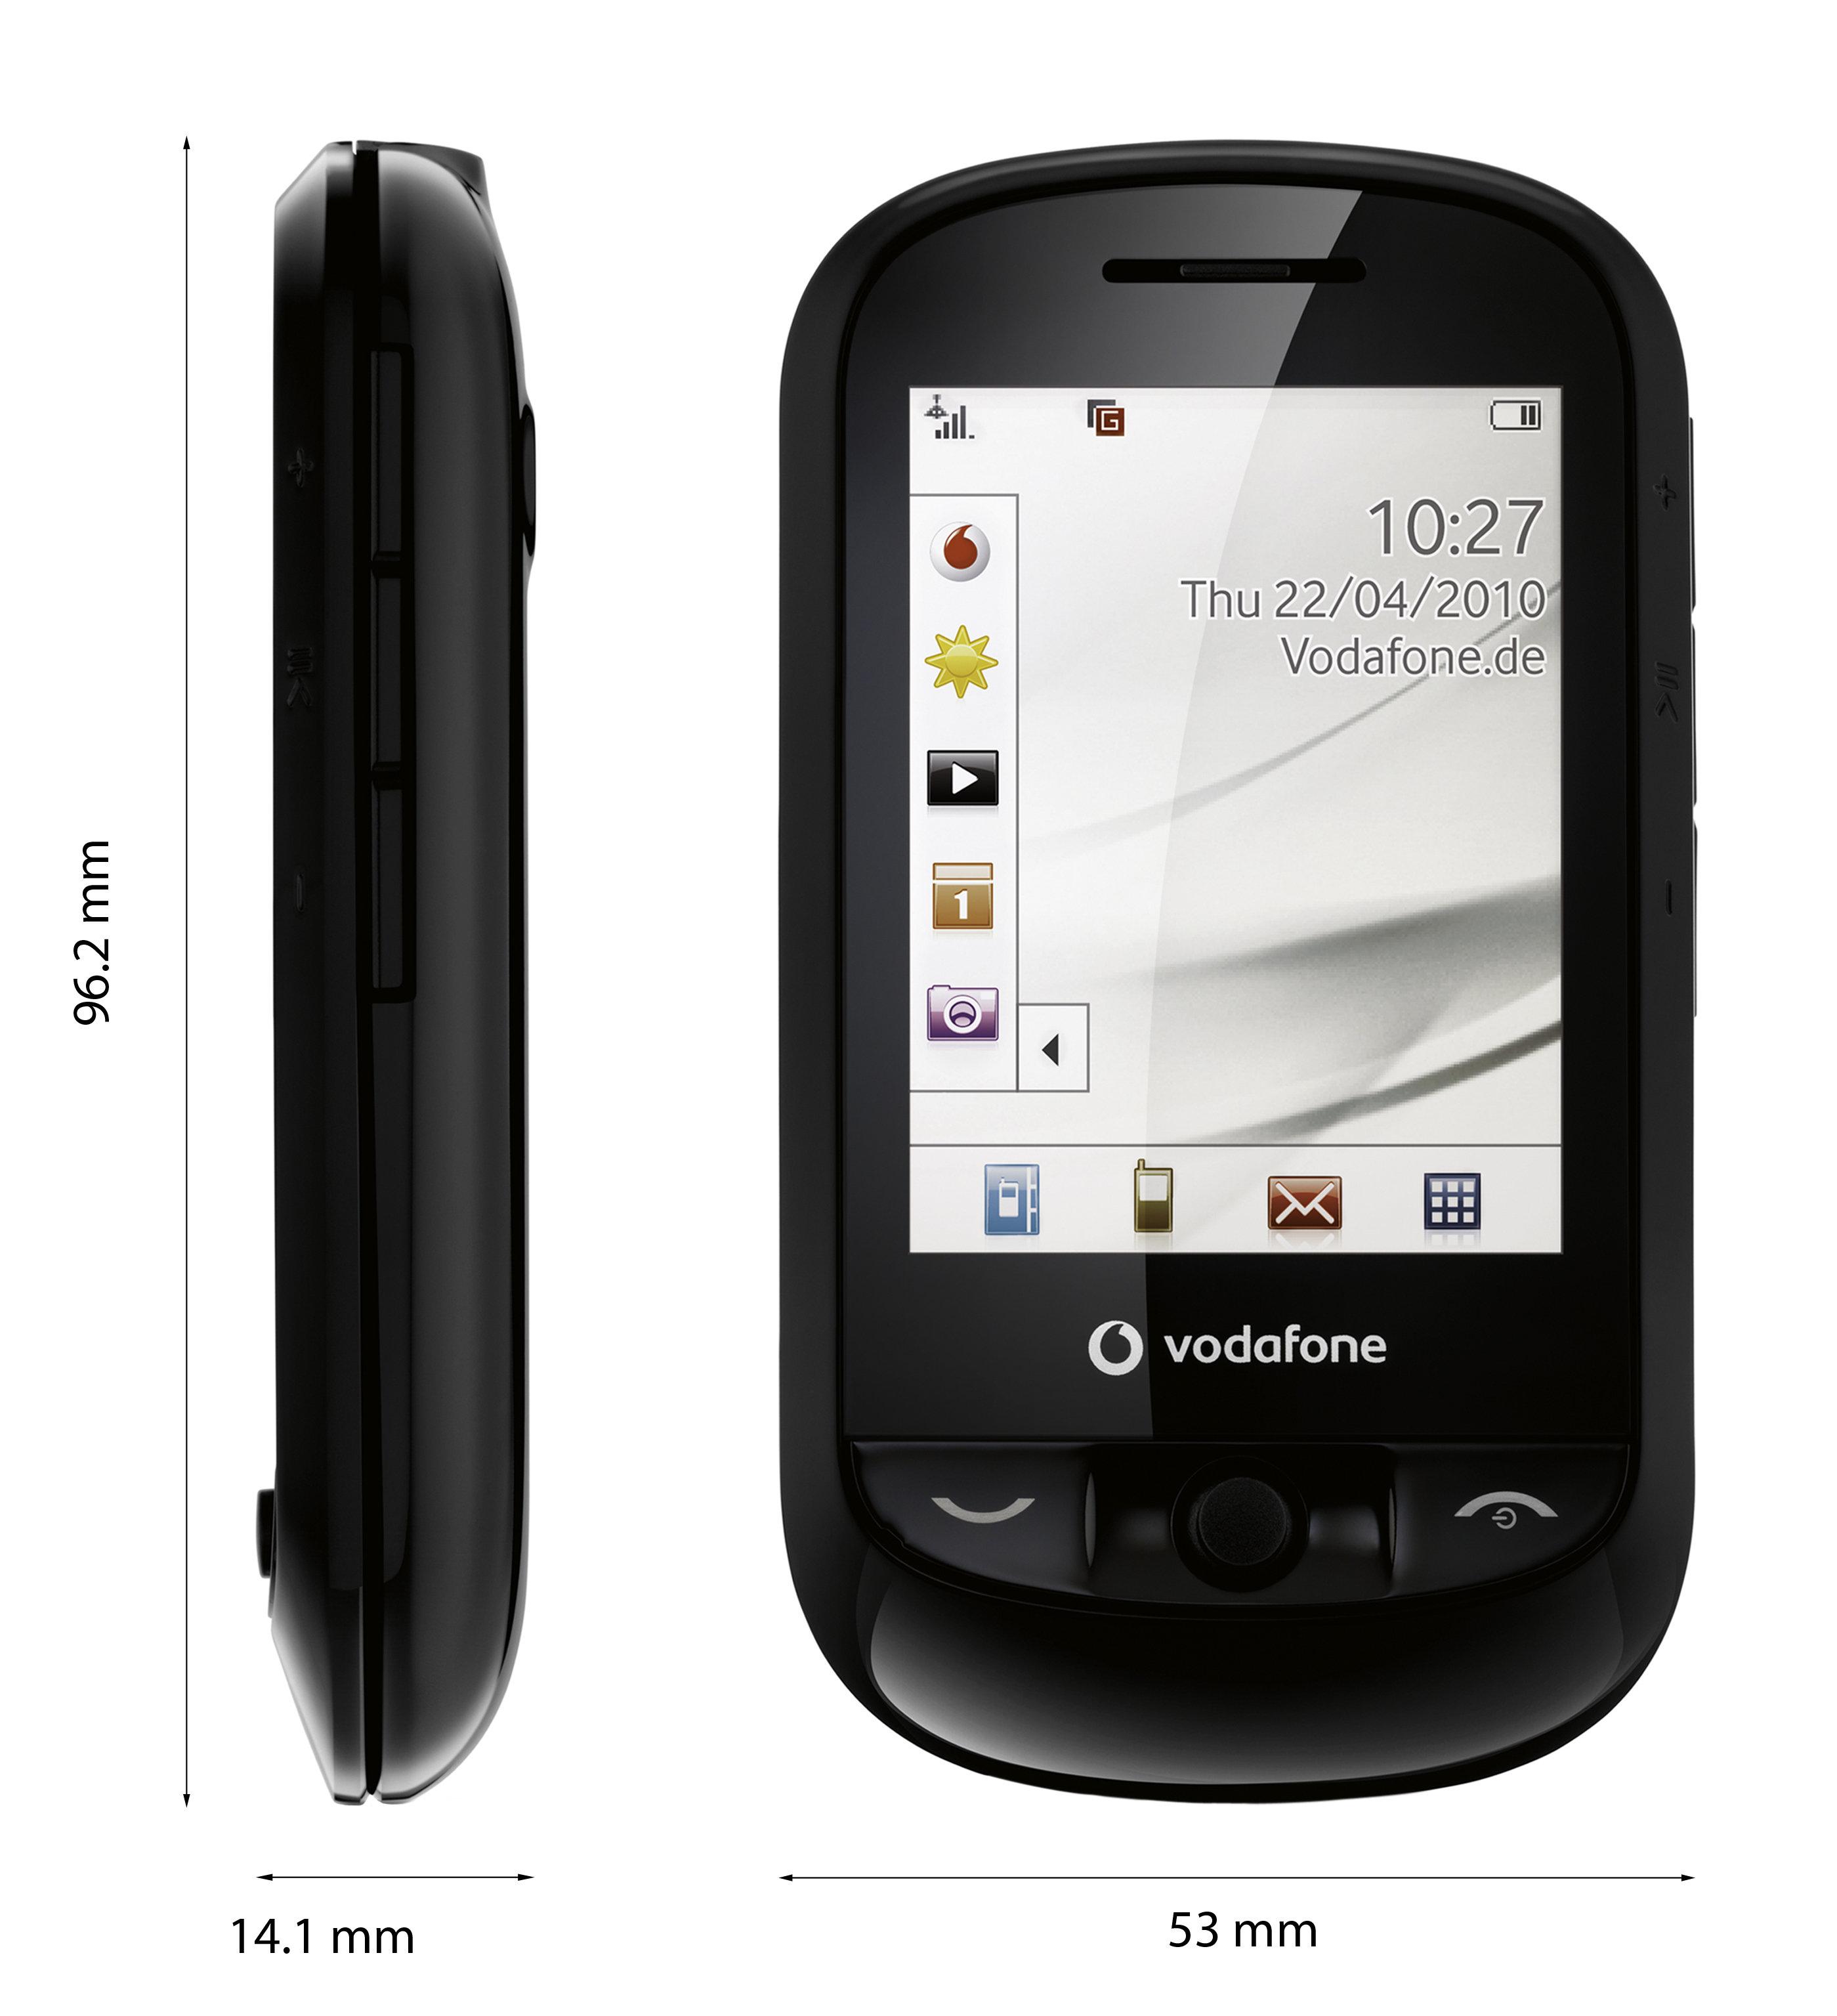 Amazon Uk: Vodafone 543 Pay As You Go Handset